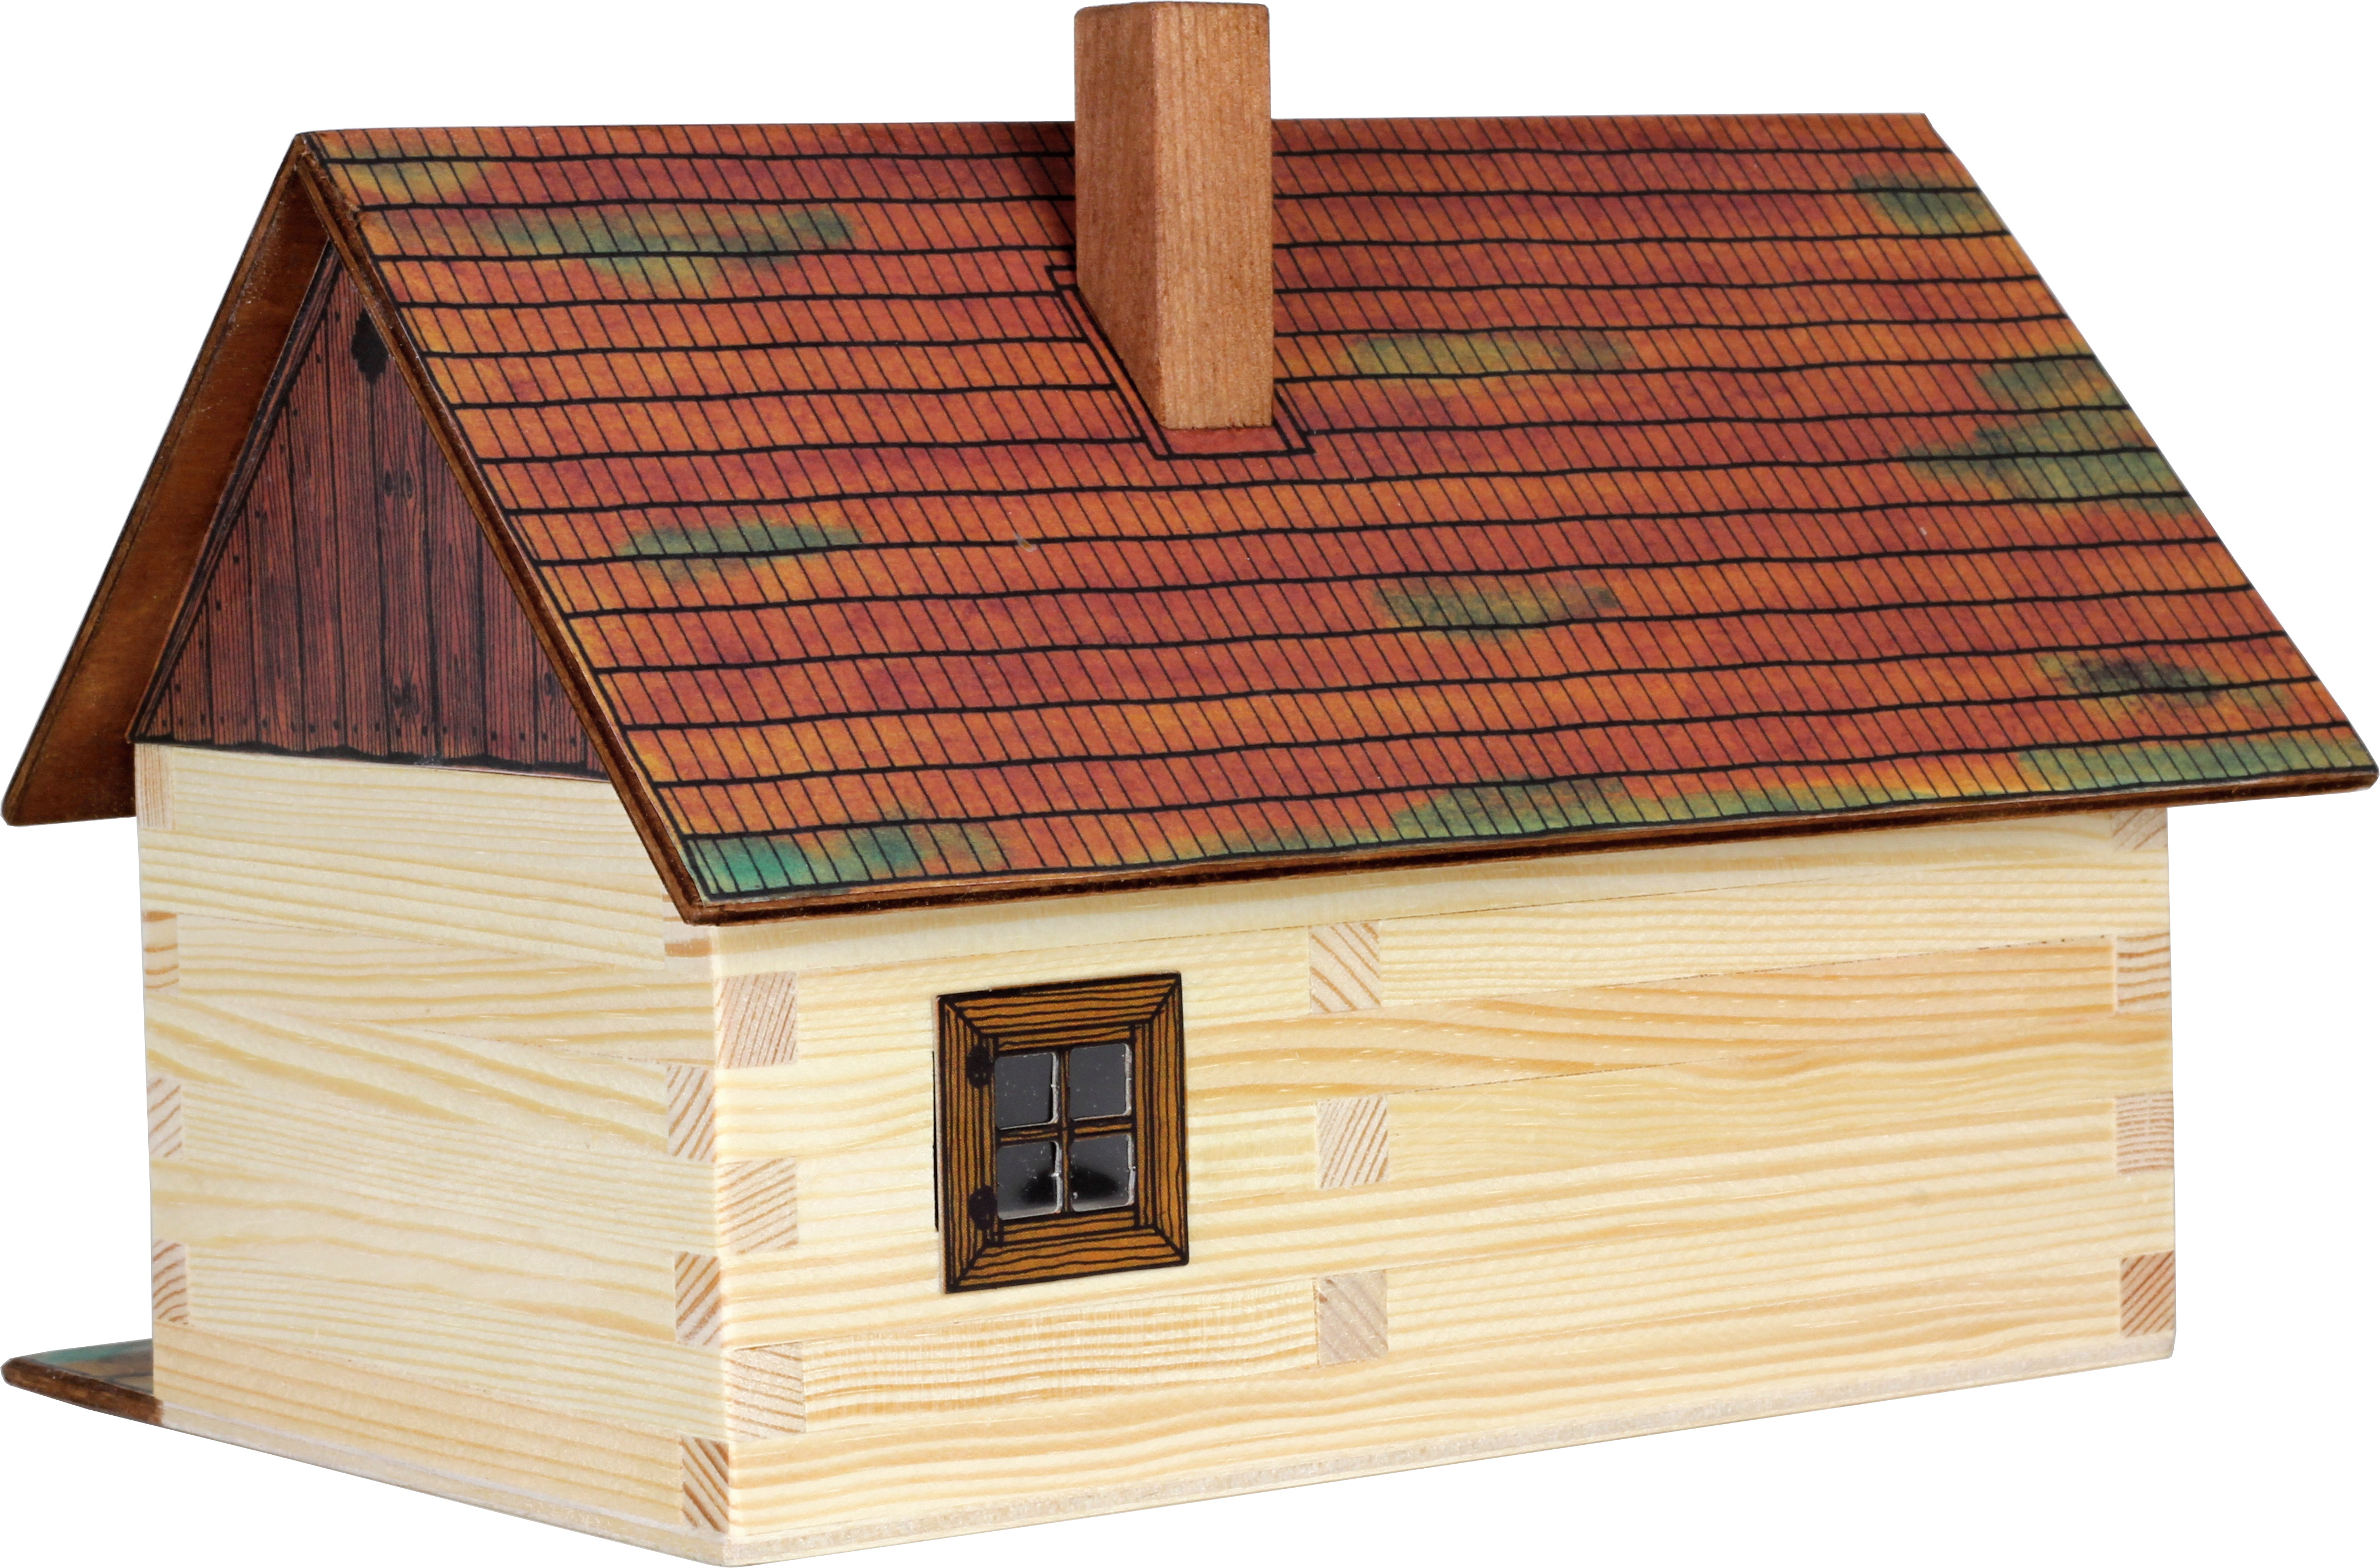 Cabana de lemn - joc educativ de construit Walachia 1